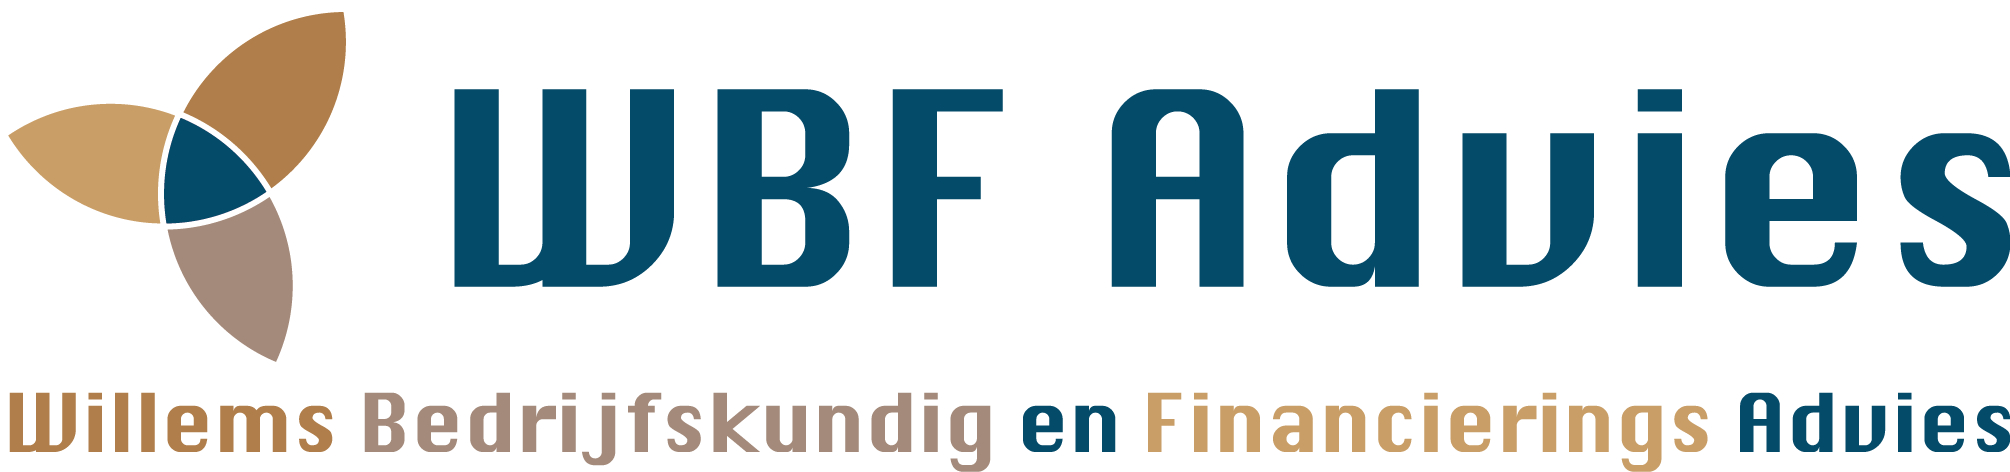 WBF Advies